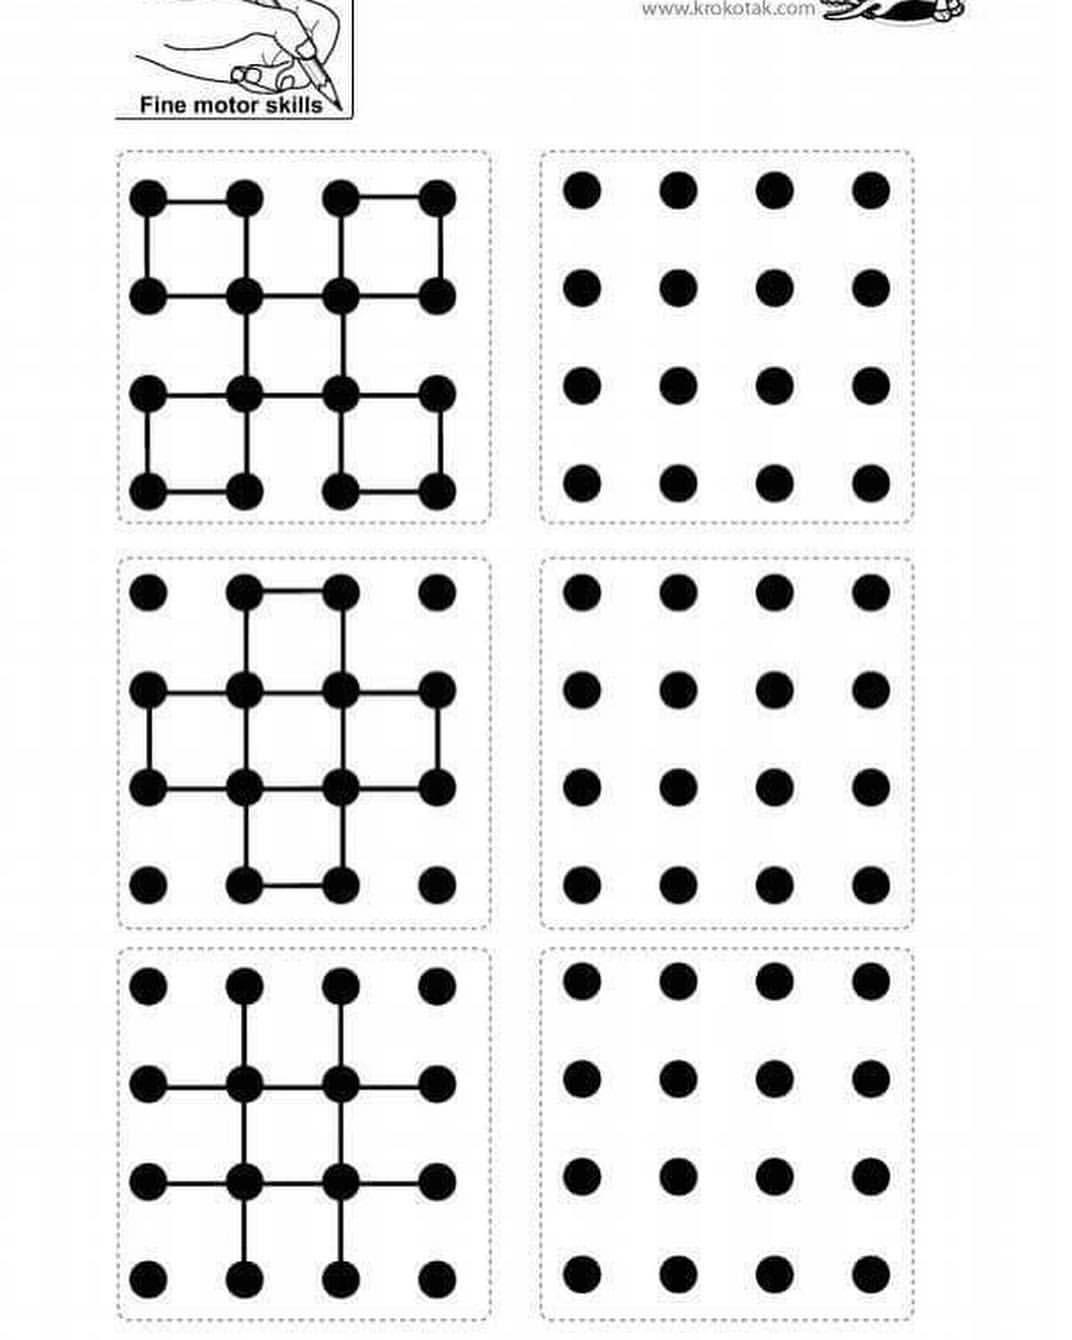 Simetri Dikkat Gorsel Algi Calisma Sayfasi Daha Once